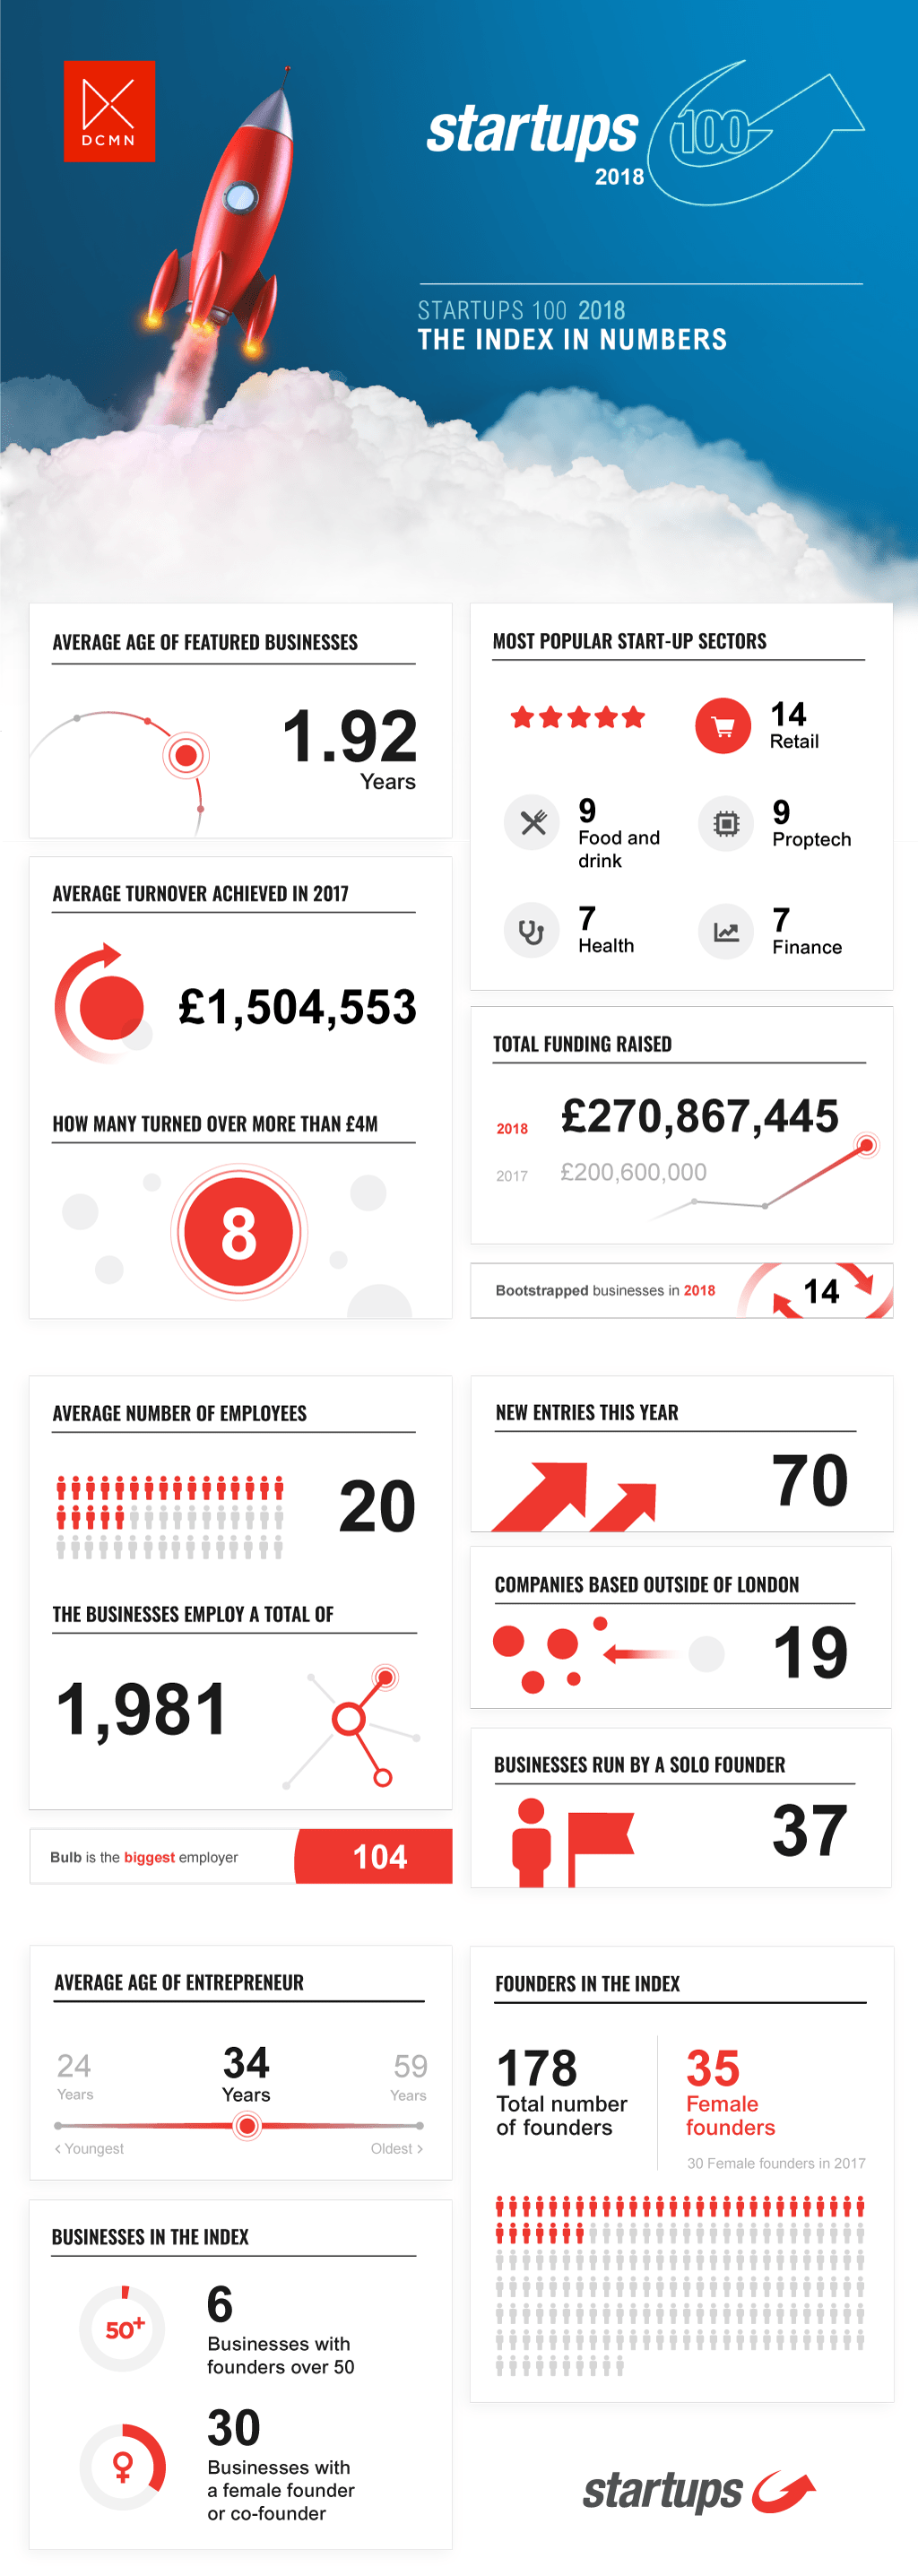 Startups 100 2018 infographic